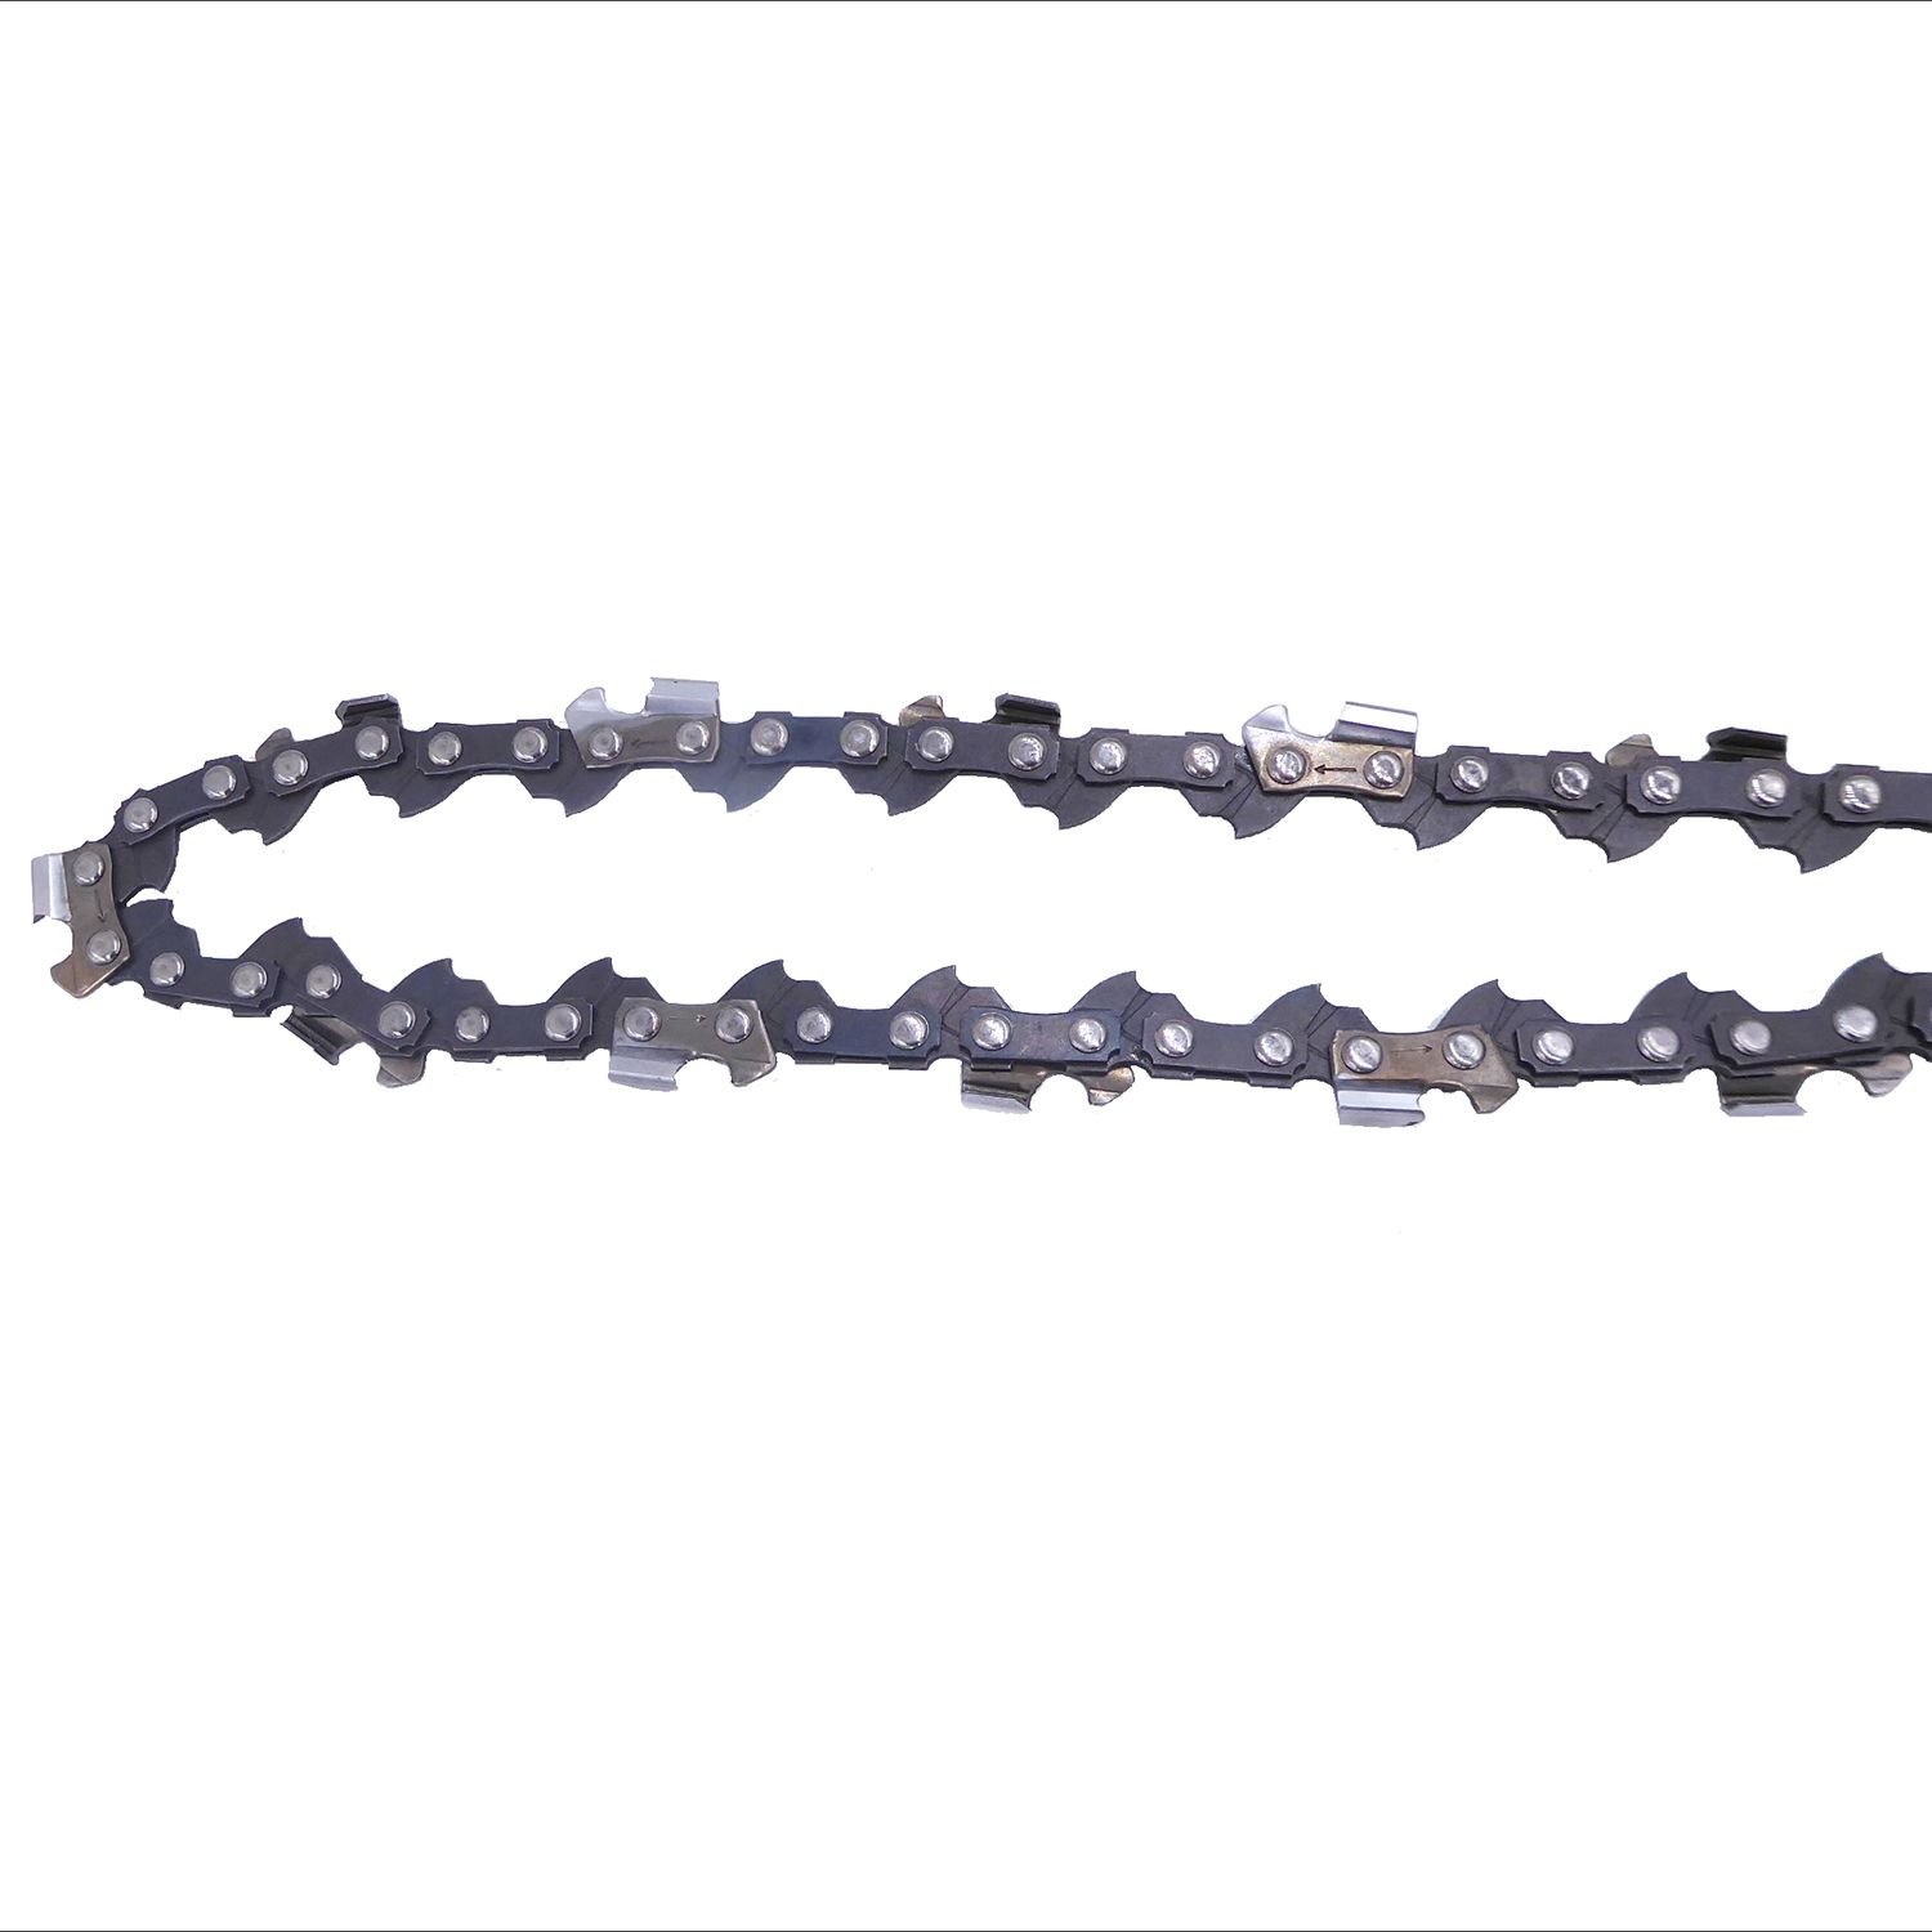 S/ägekette Ersatzkette f/ür Motors/äge PARTNER 370 Schwert 35 cm 3//8 1,3